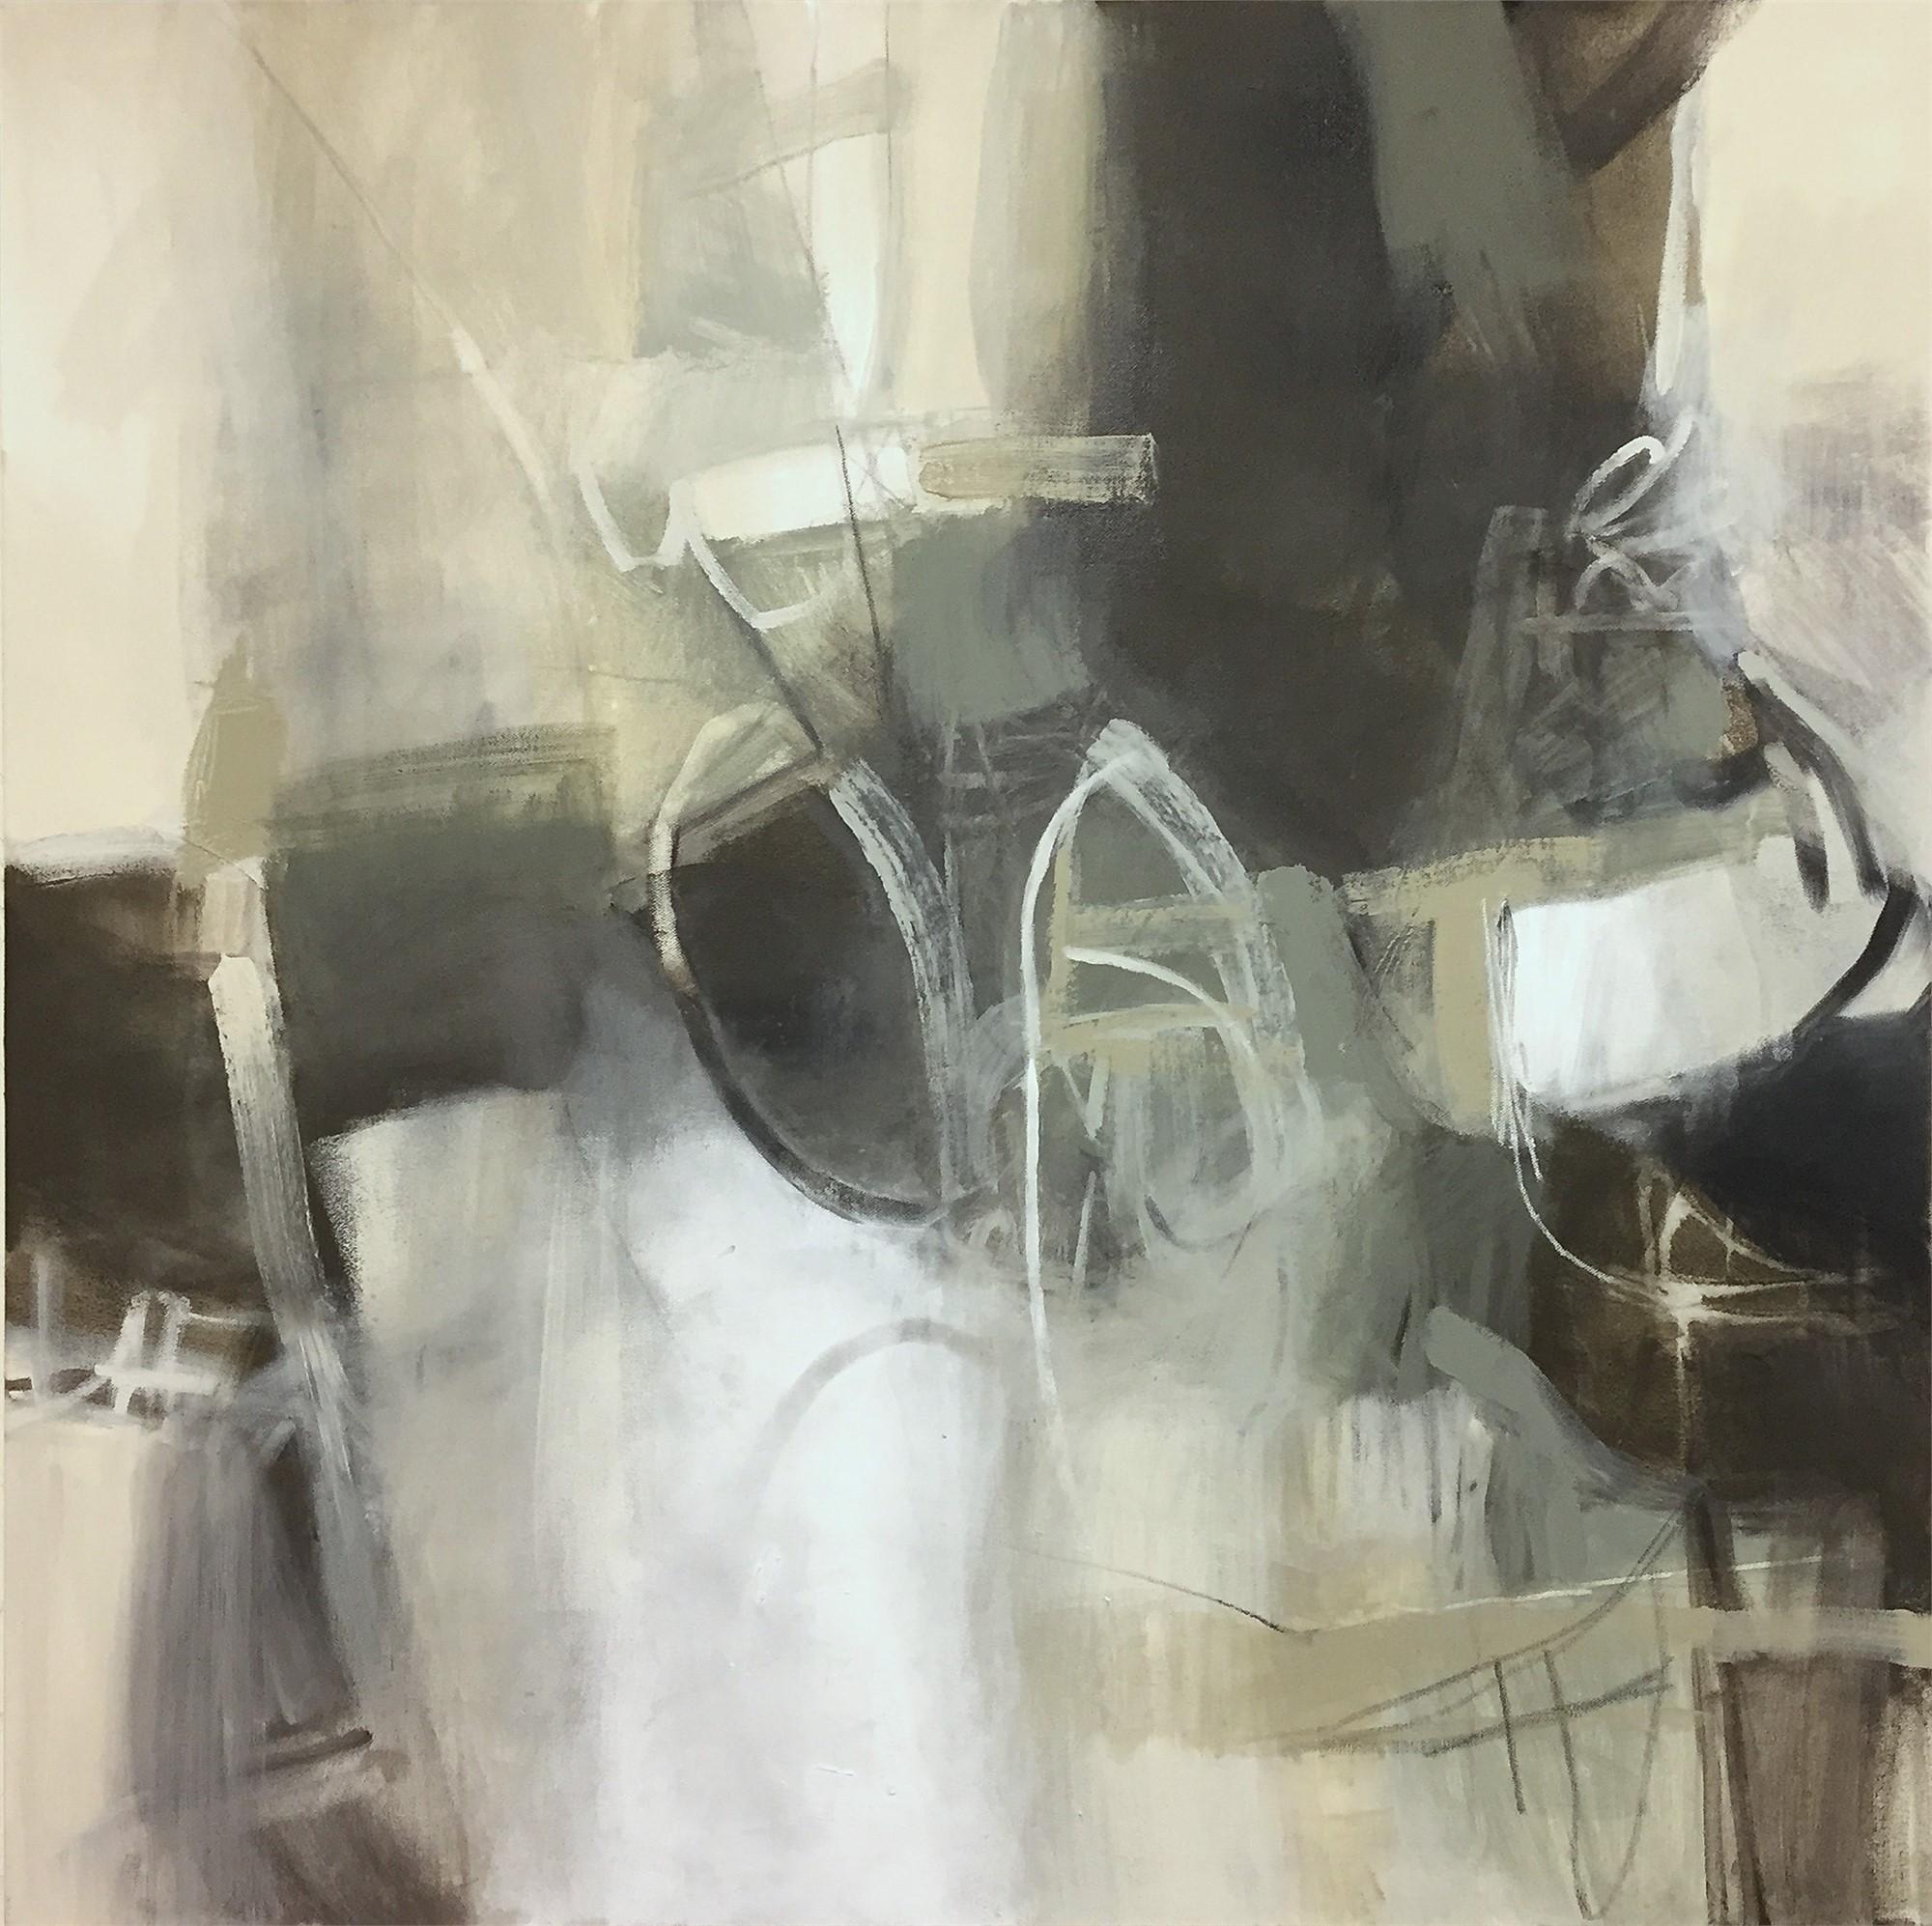 Untitled 174644 by Karen Roehl